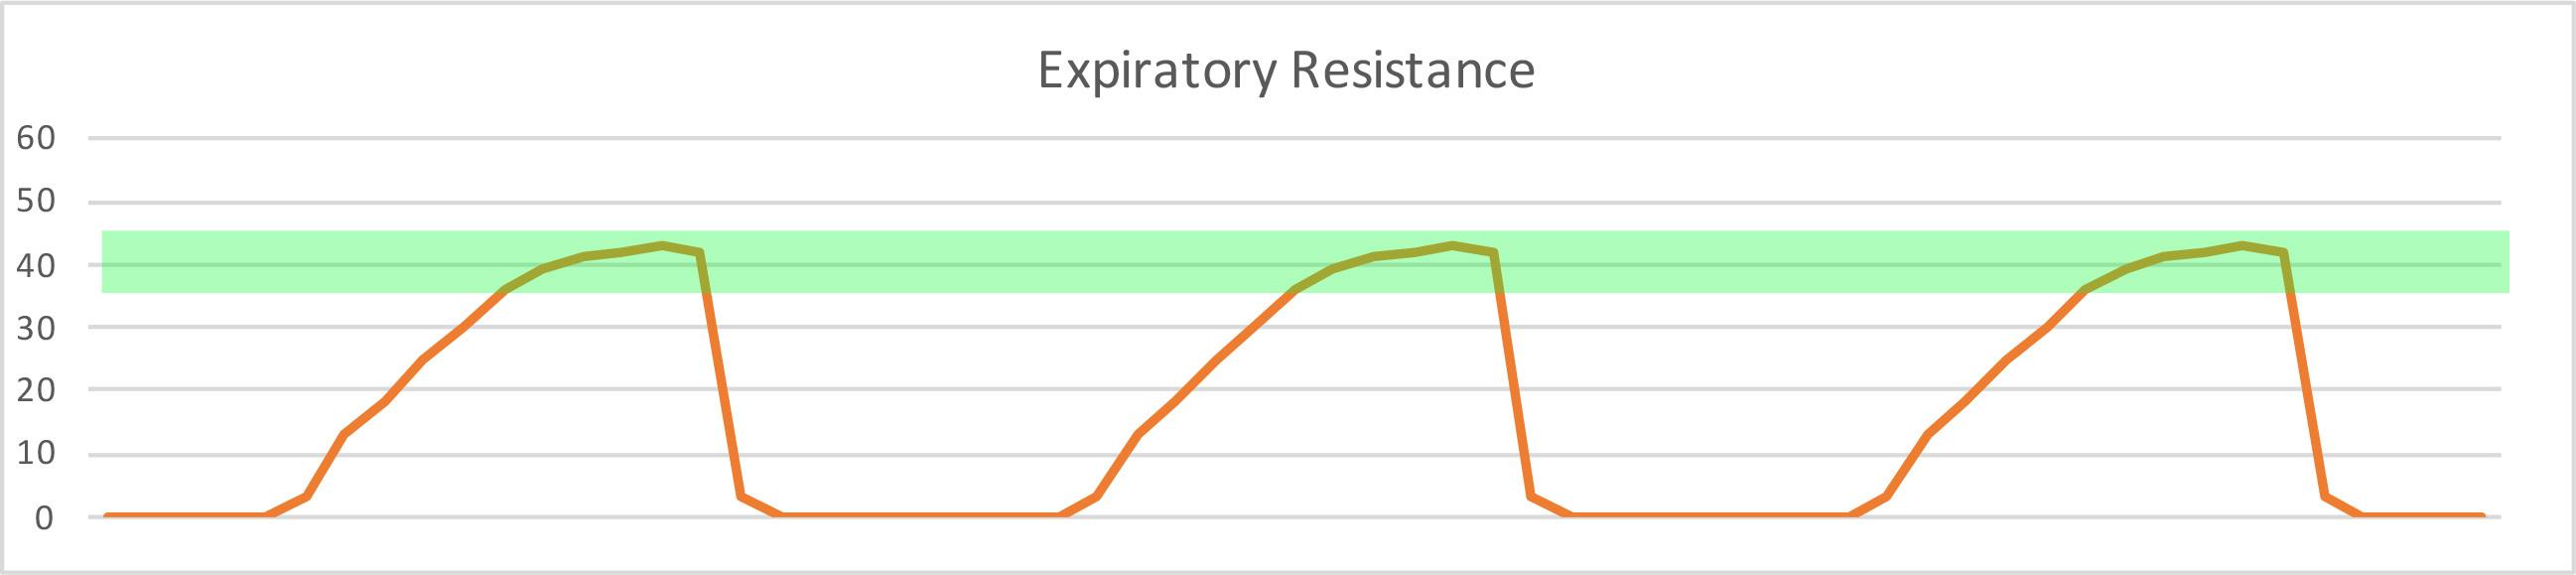 expiratory-resistance.jpg#asset:3114